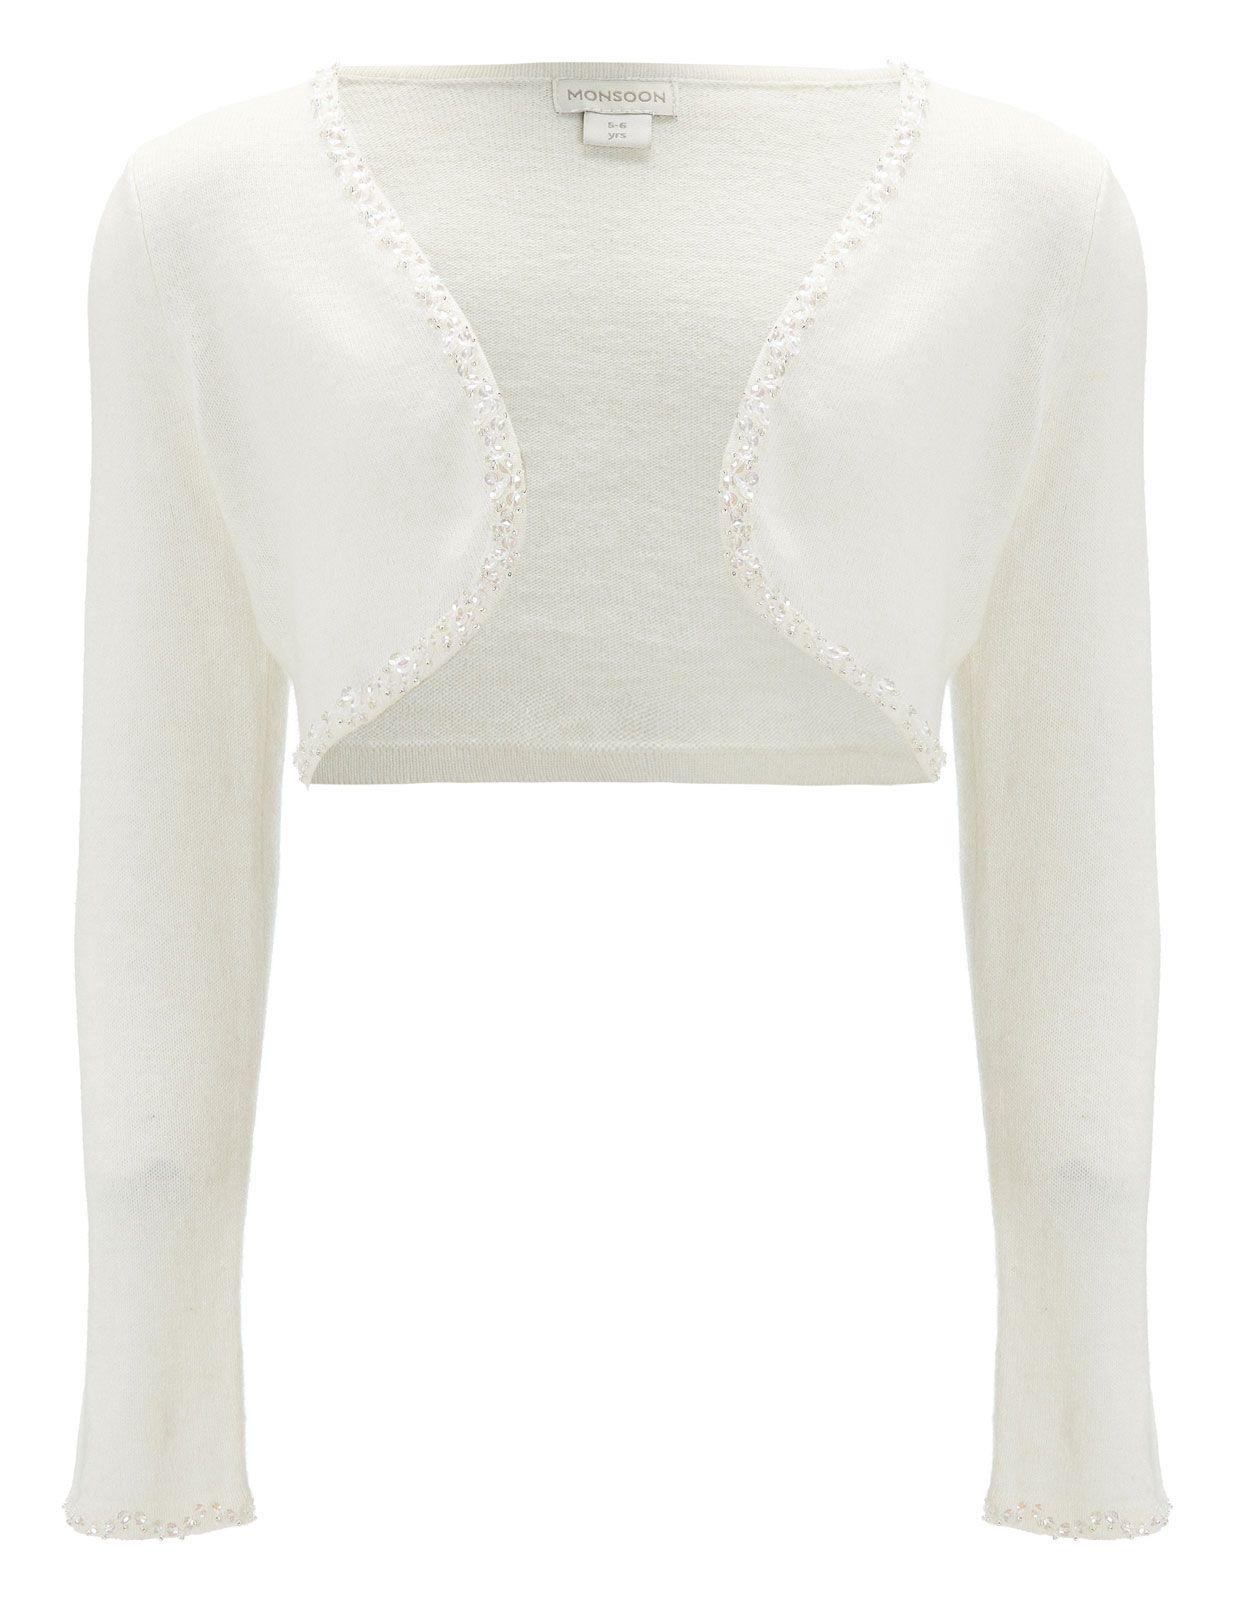 Estella Sequin Cardigan   White   Monsoon, vestje 24 pond. Check ...